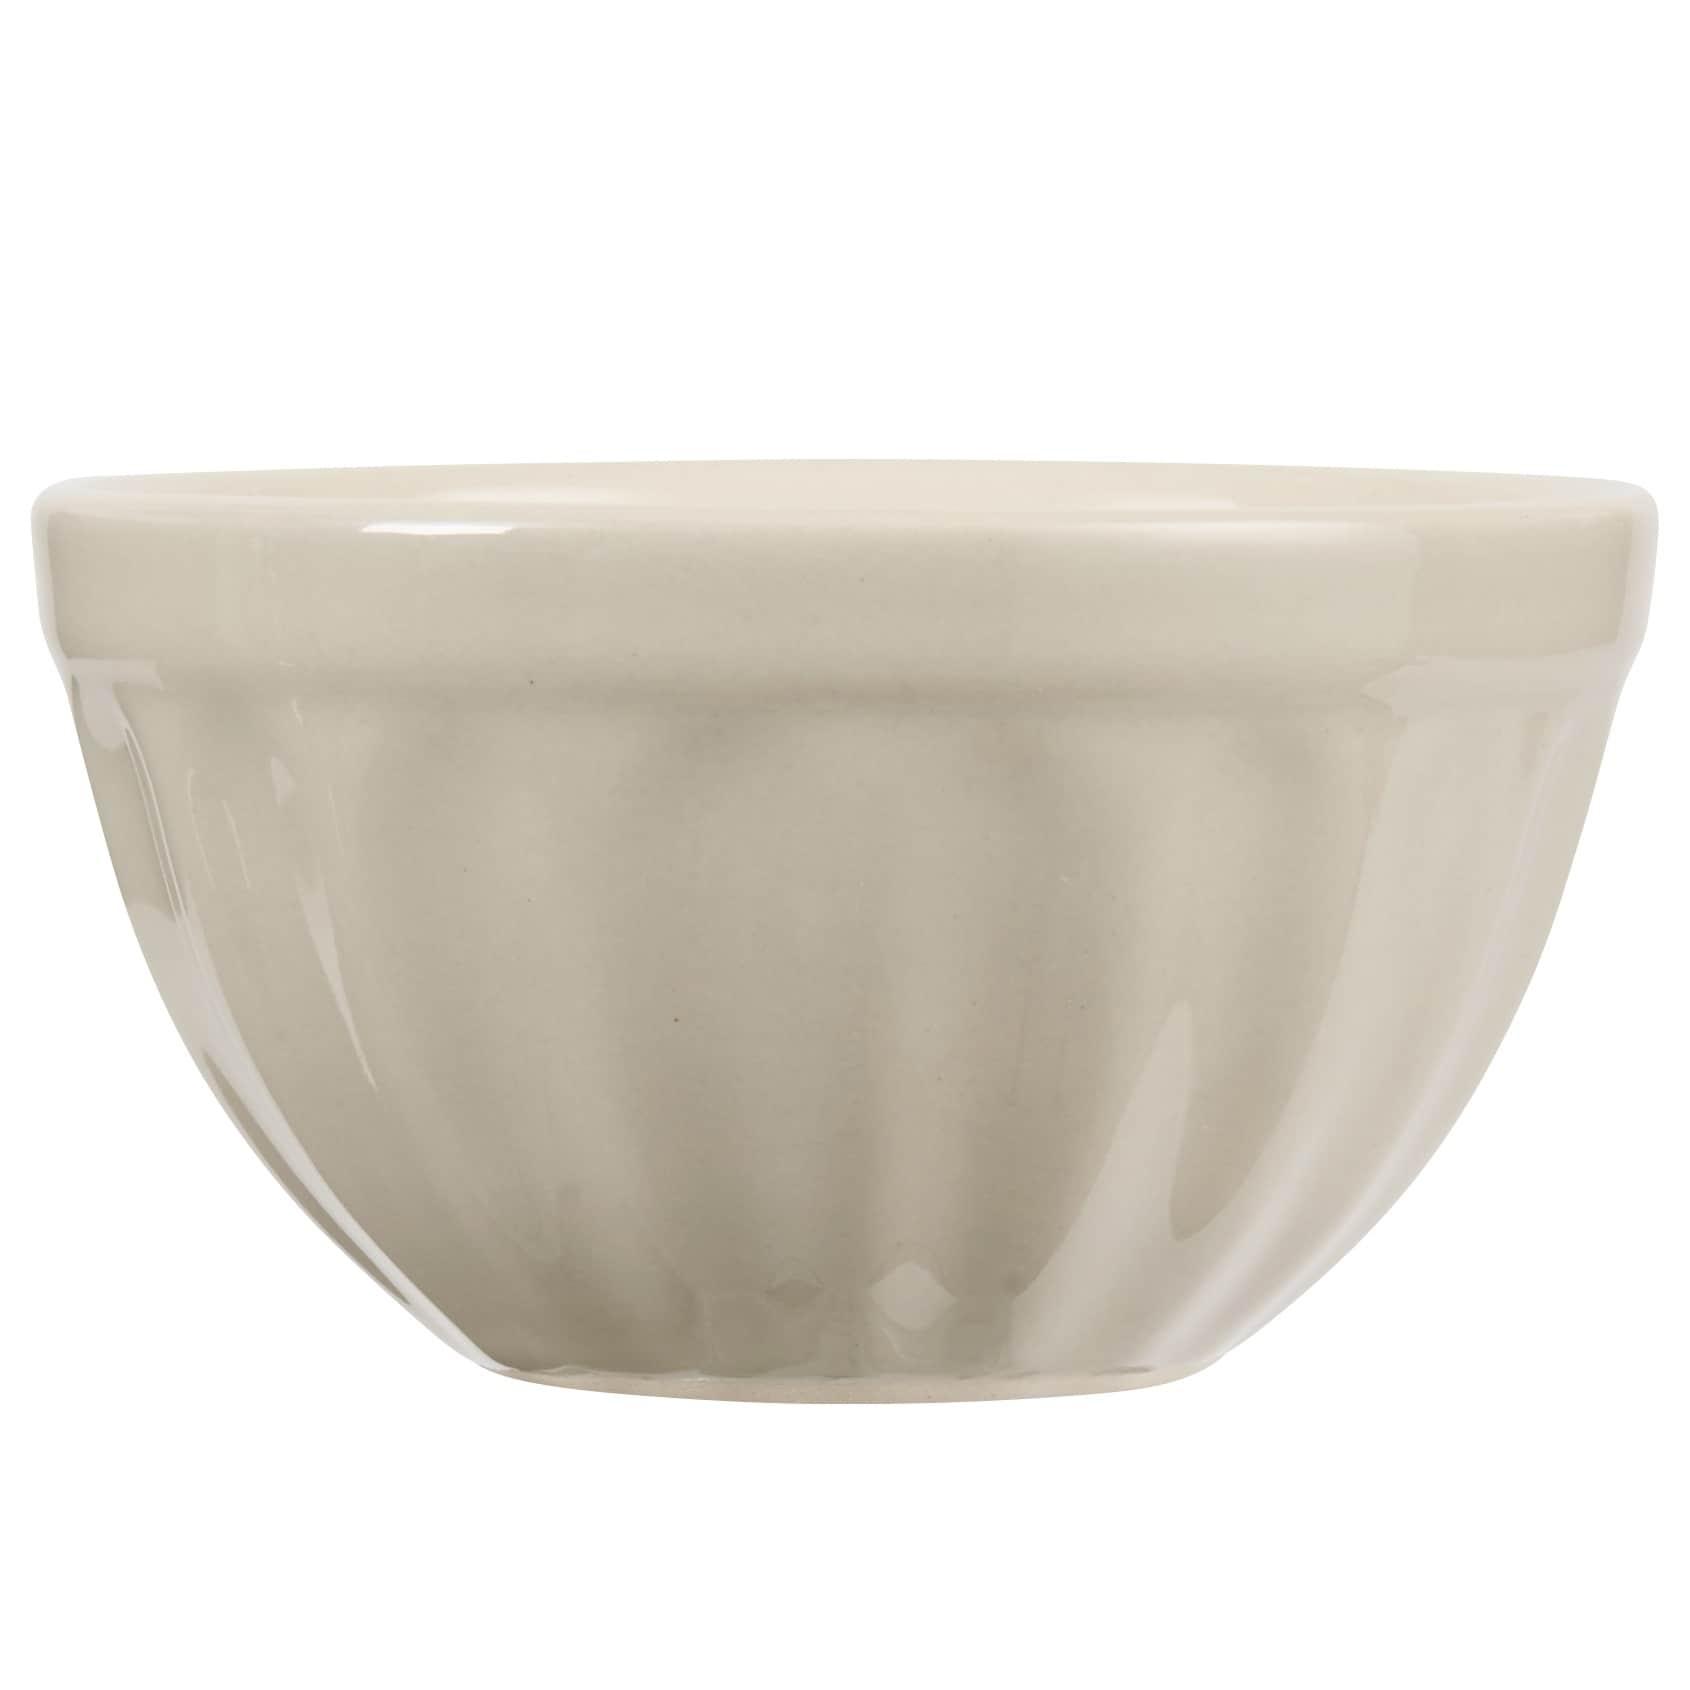 IB LAURSEN Miska na müsli Mynte latte, béžová barva, keramika